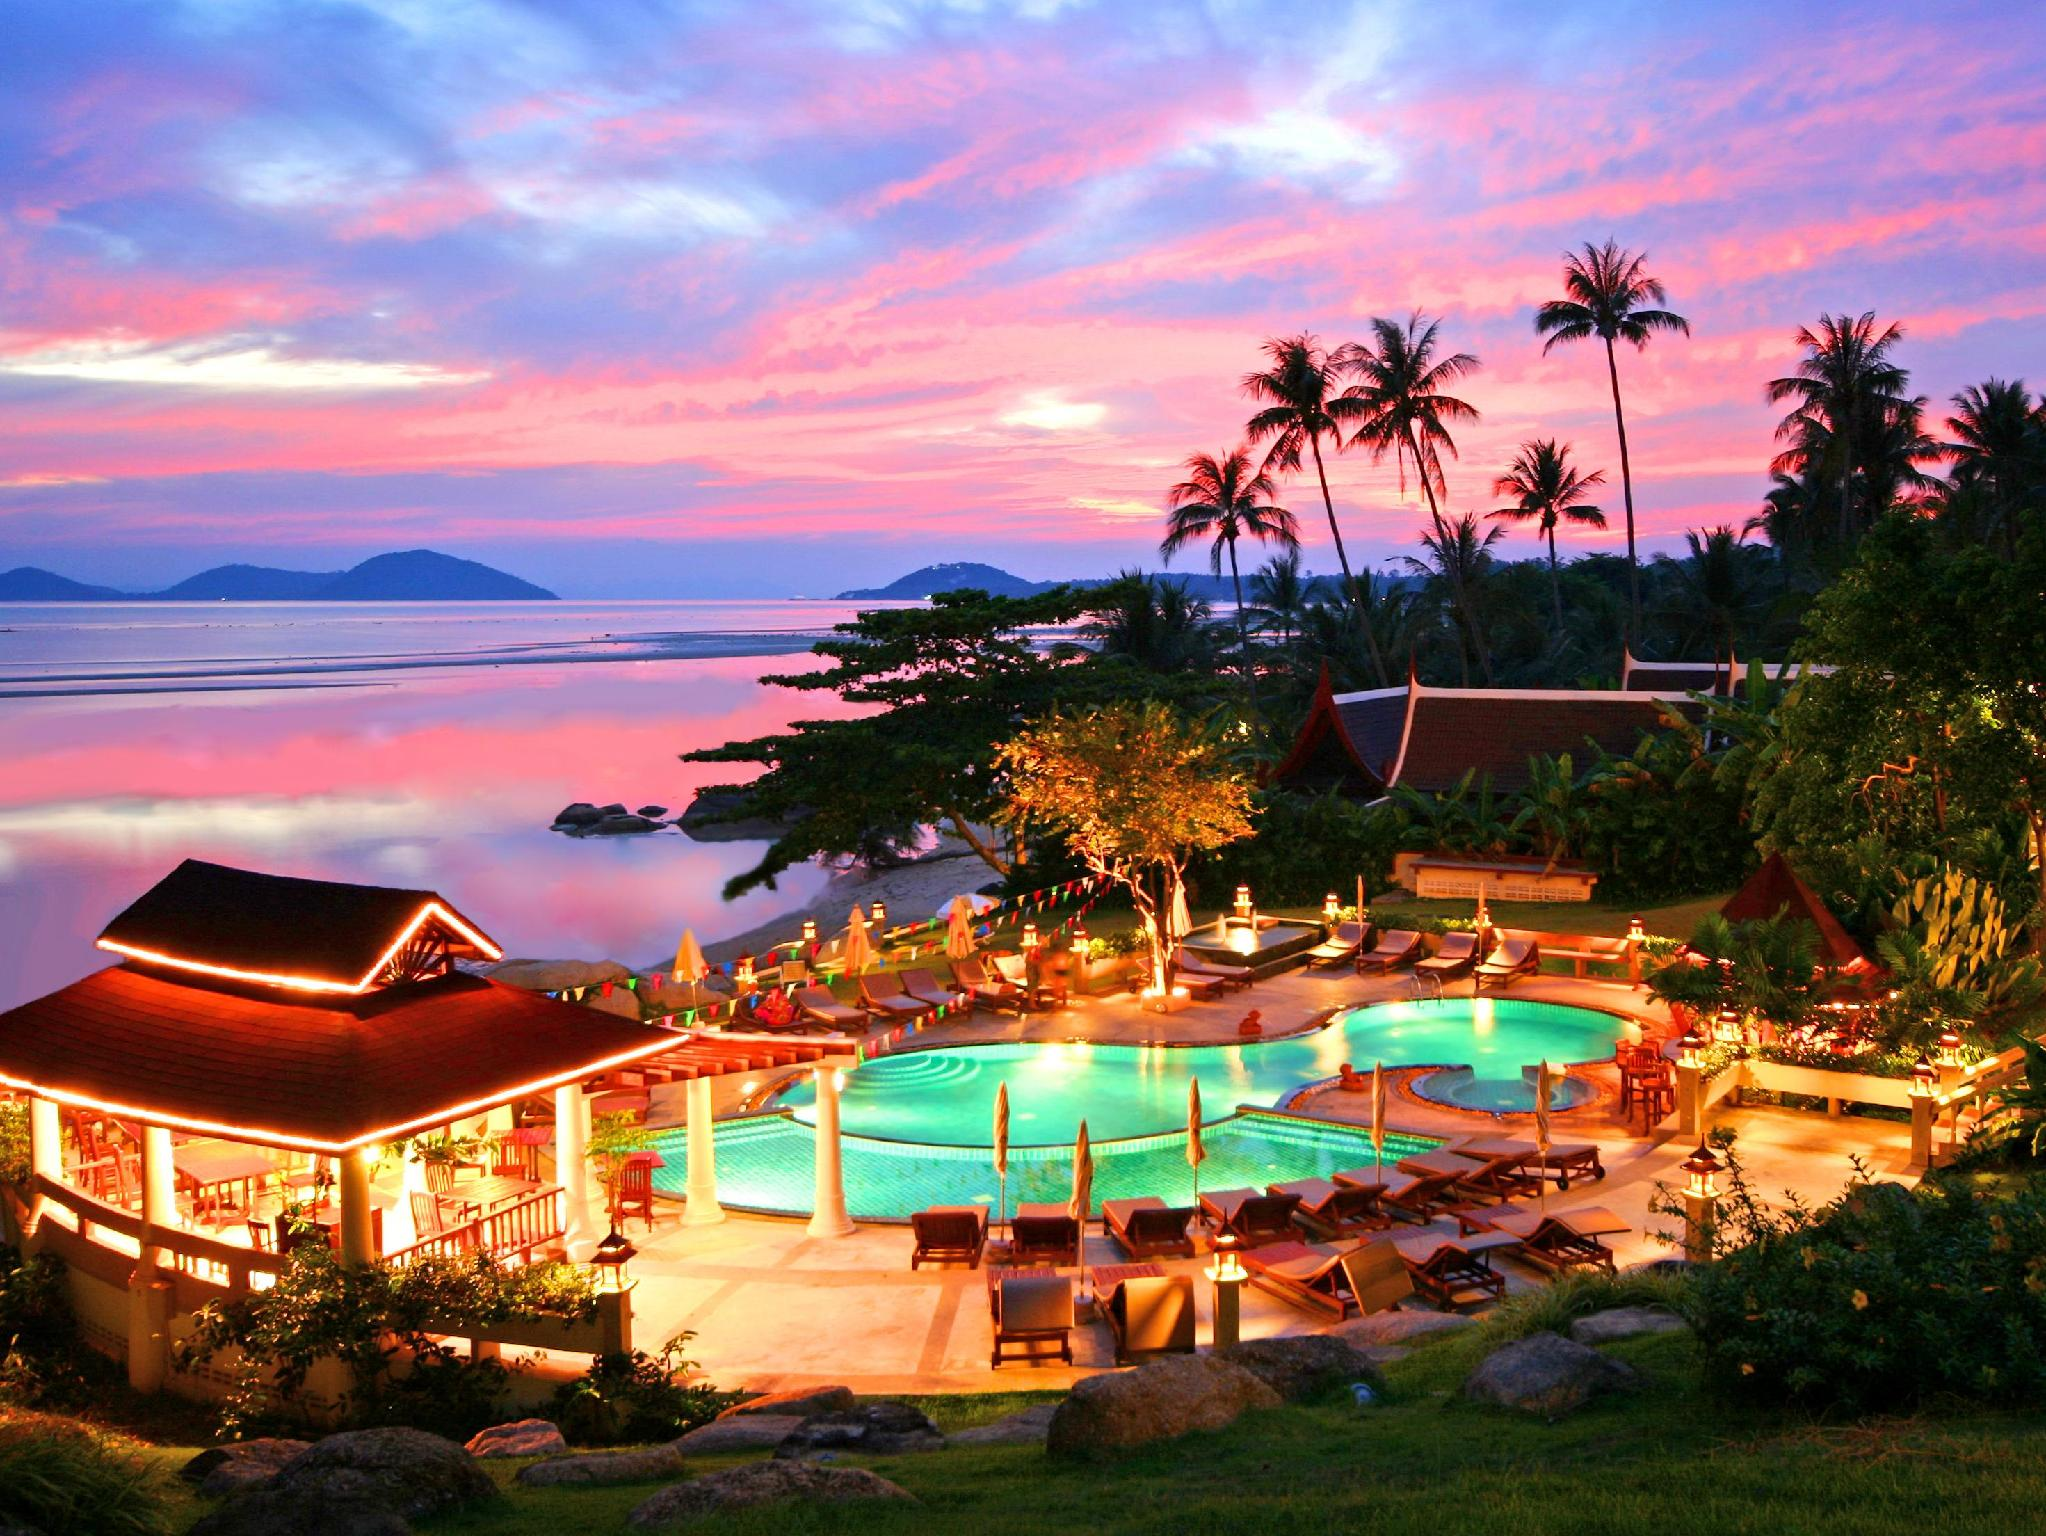 Banburee Wellness Resort & Spa